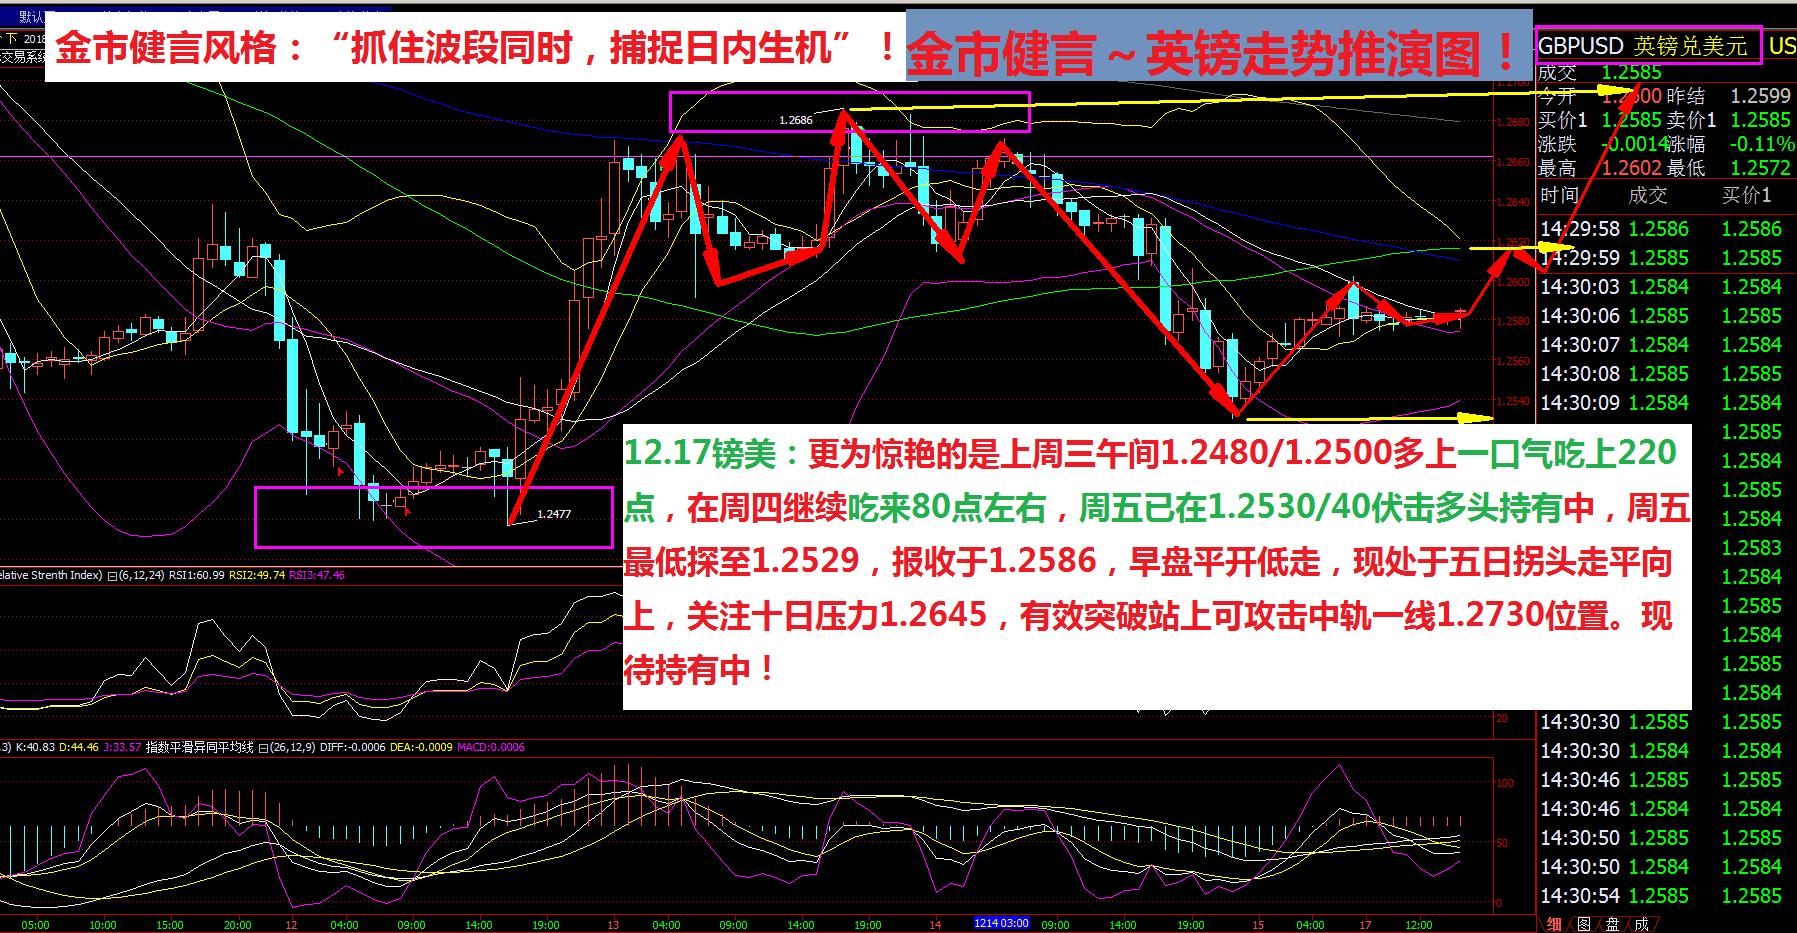 mingjiadianjin/20181217/27106810.shtml